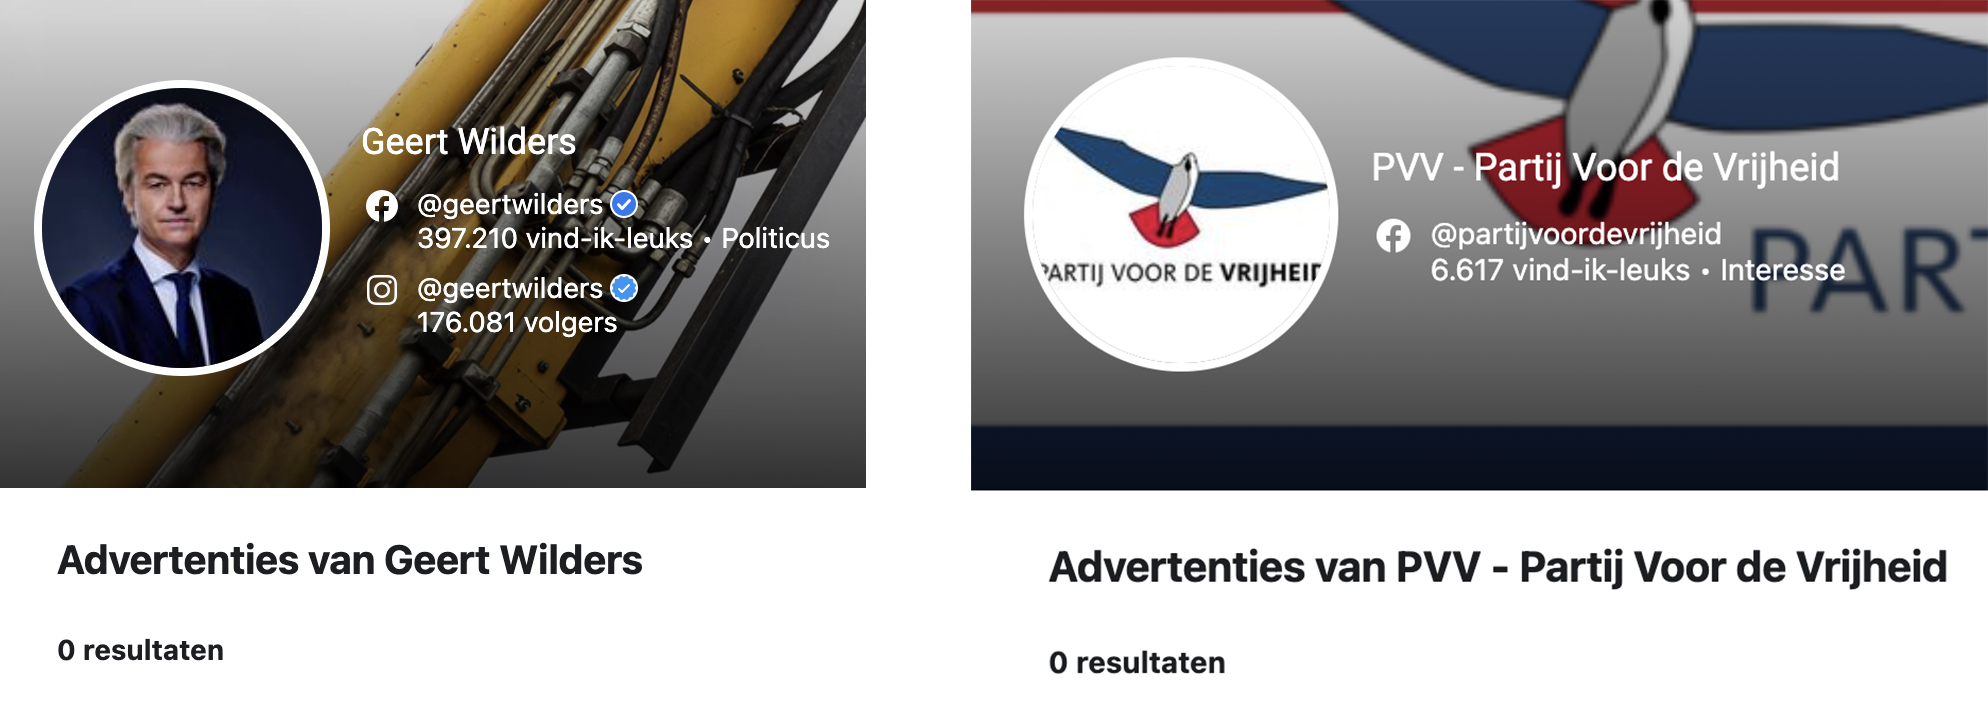 Advertenties PVV